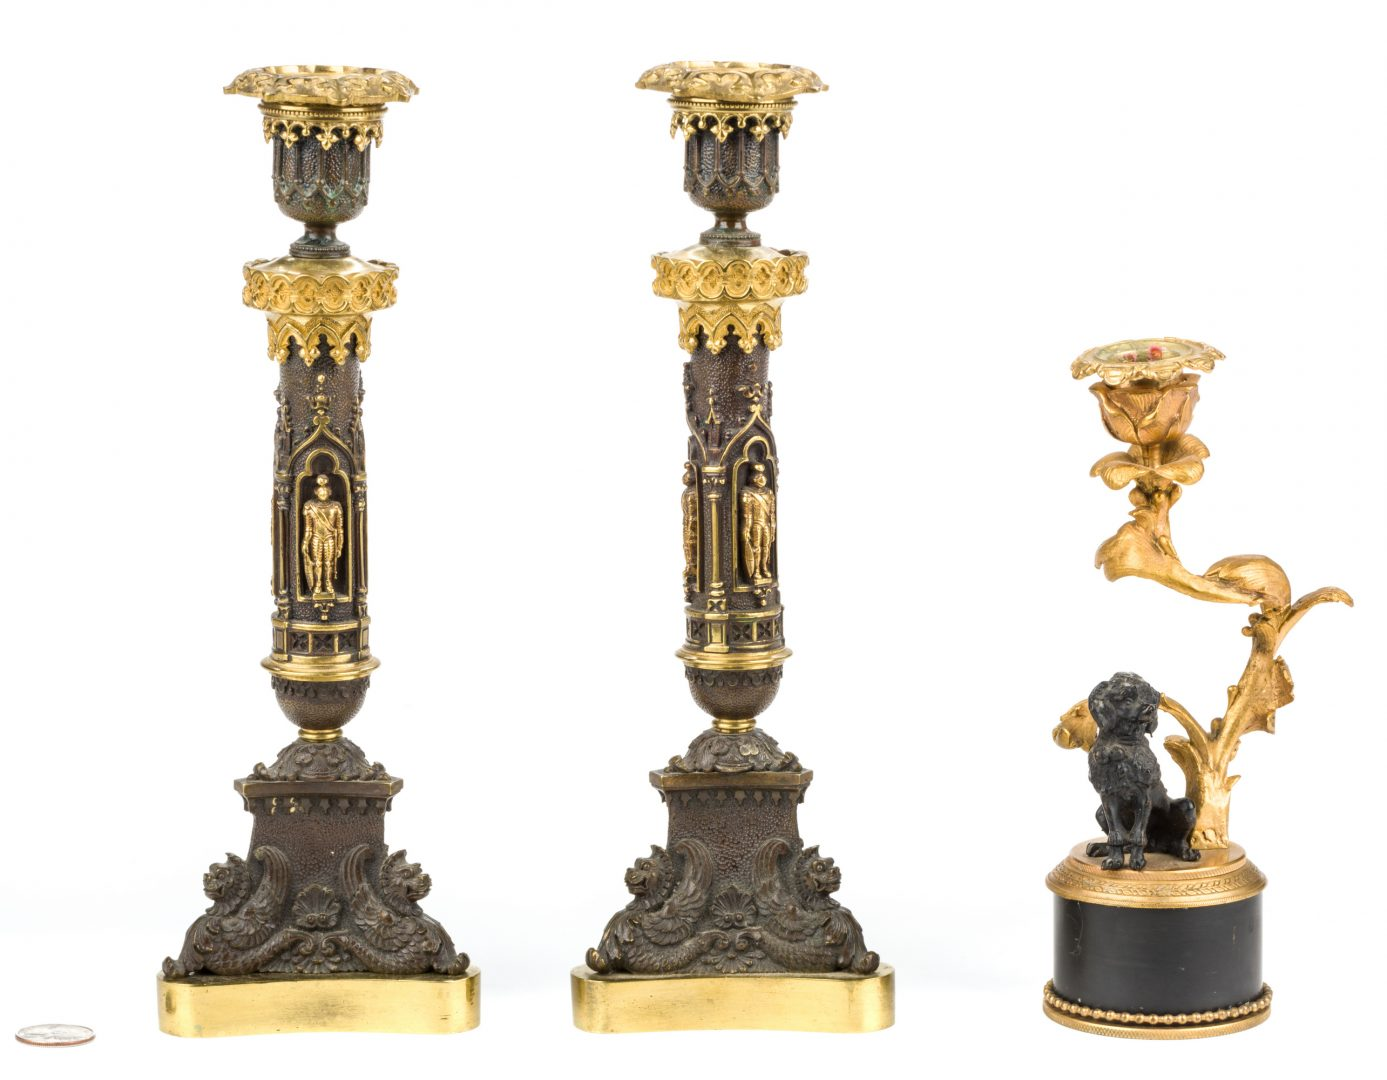 Lot 725: 3 Parcel Bronze Candlesticks